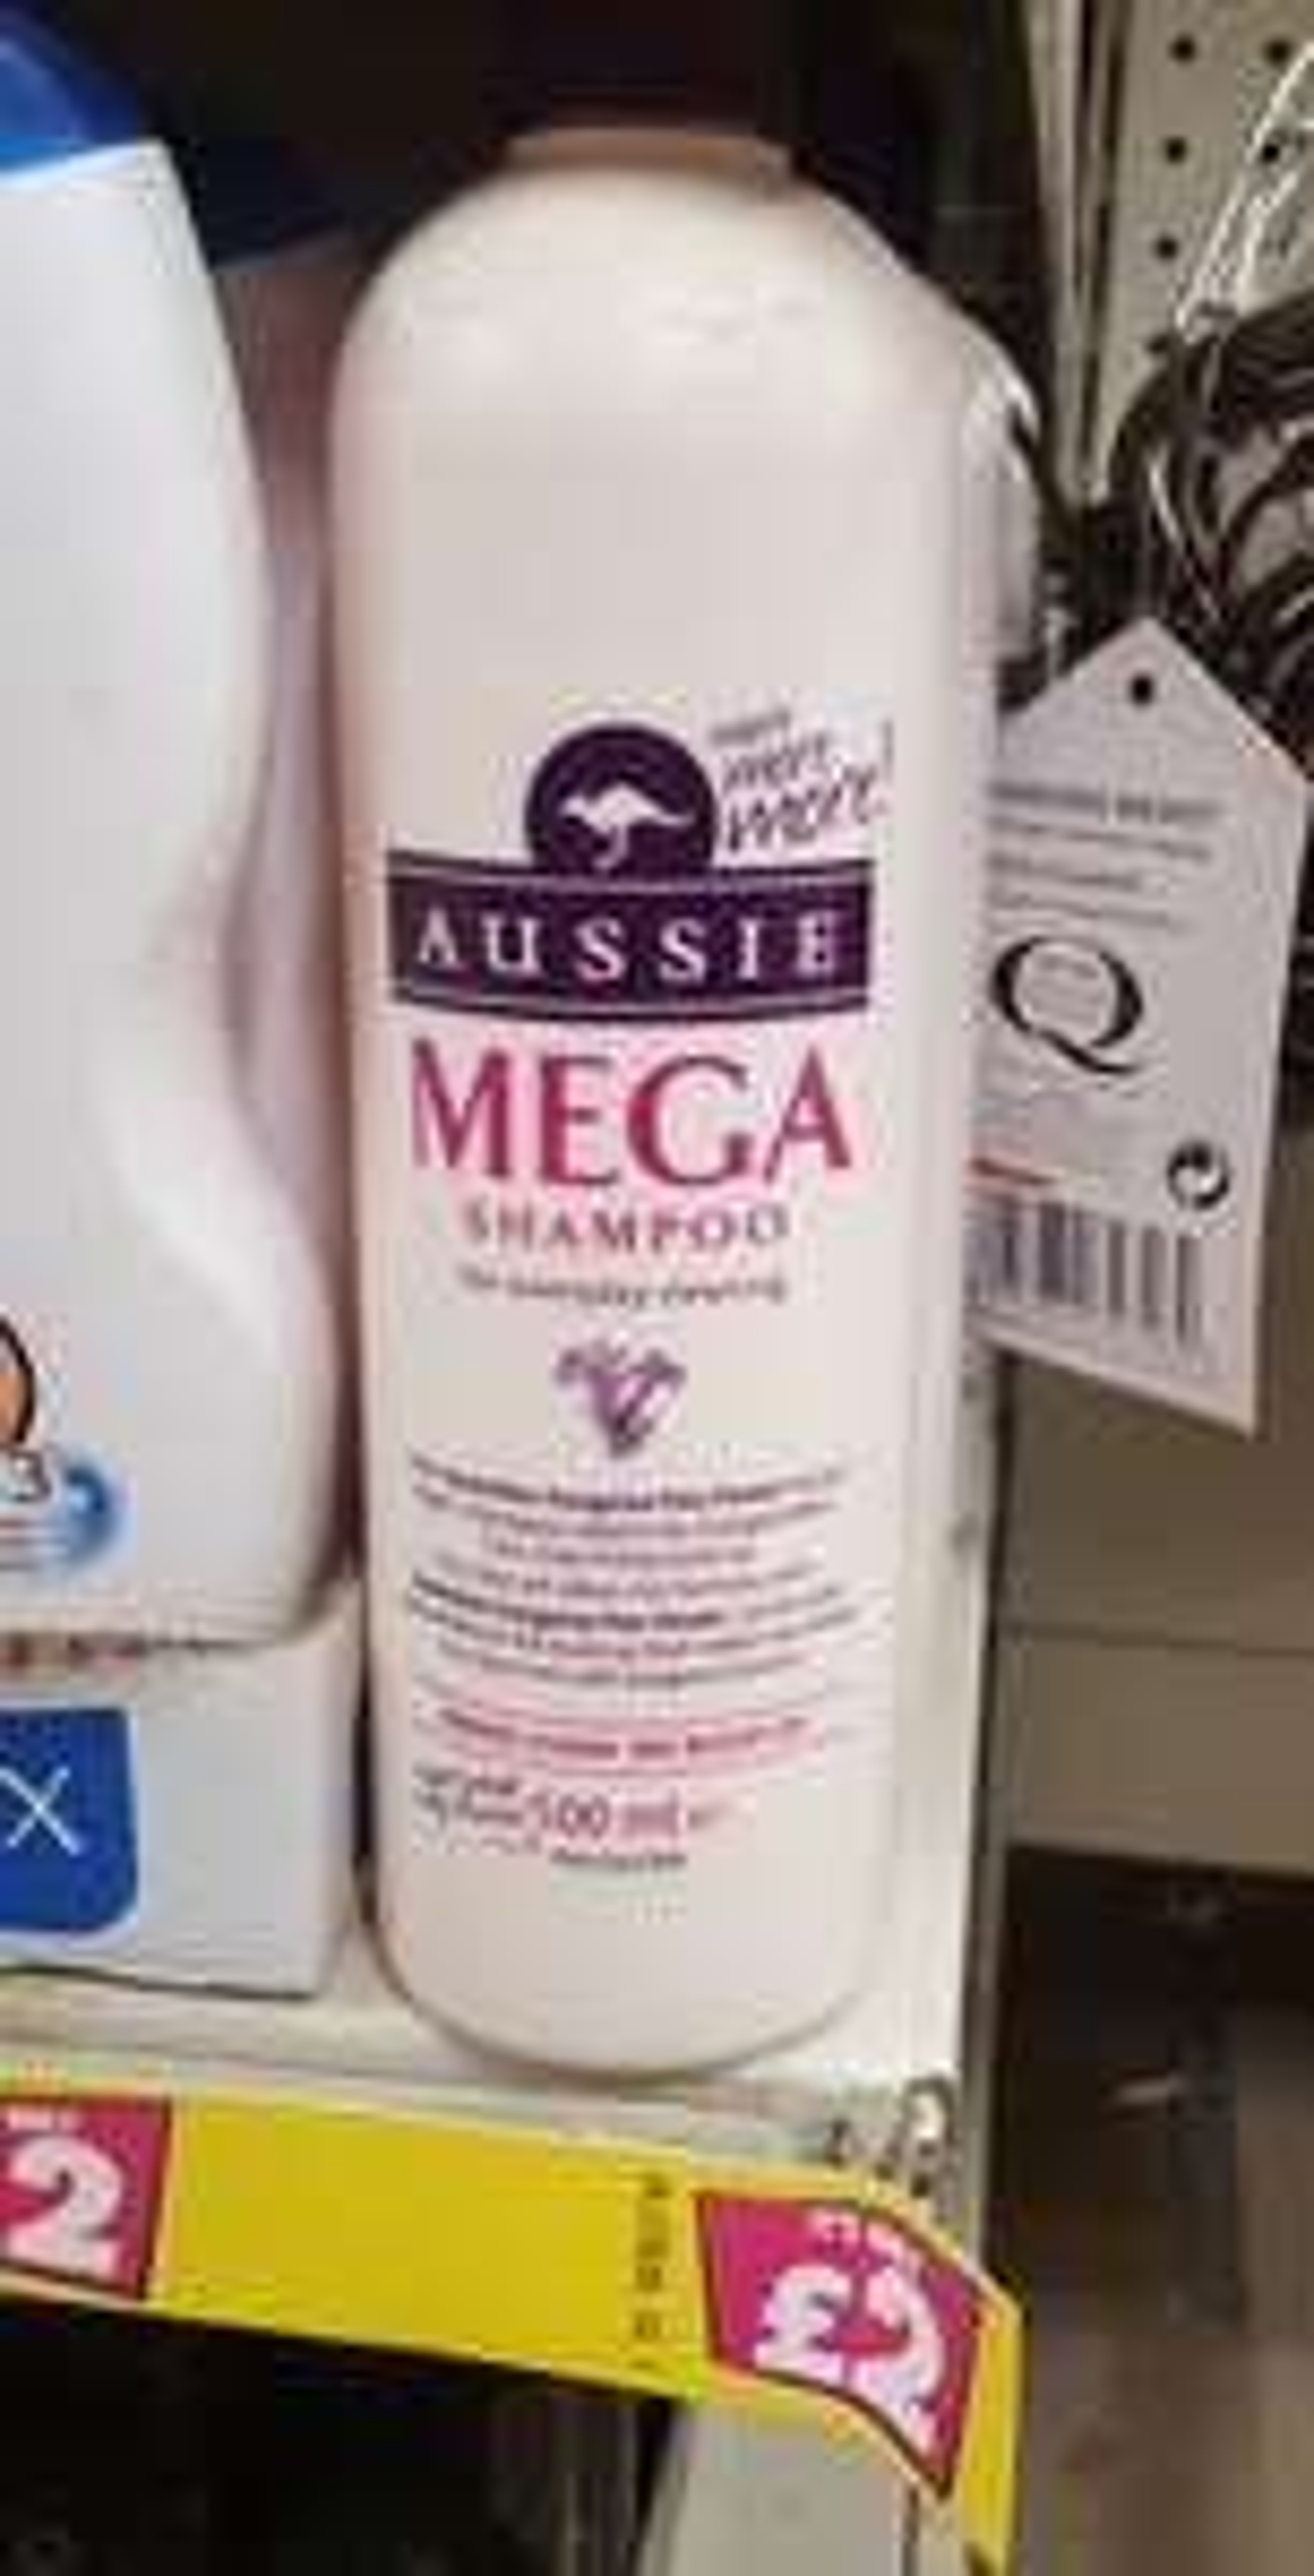 500ml Aussie Mega Shampoo - £2 instore @ Poundland